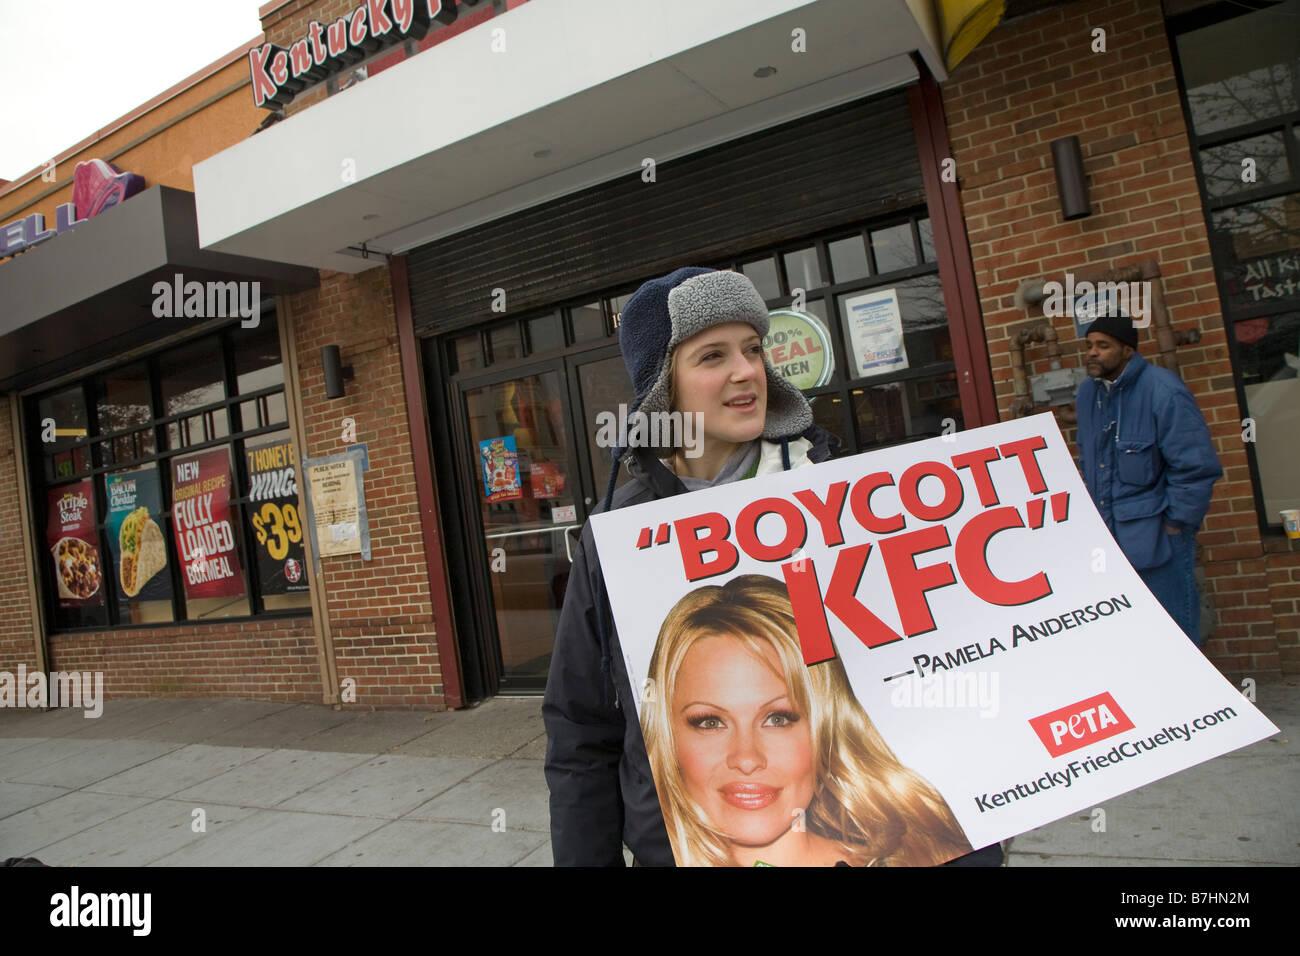 Animal Rights Activists Call for Boycott of KFC Stock Photo